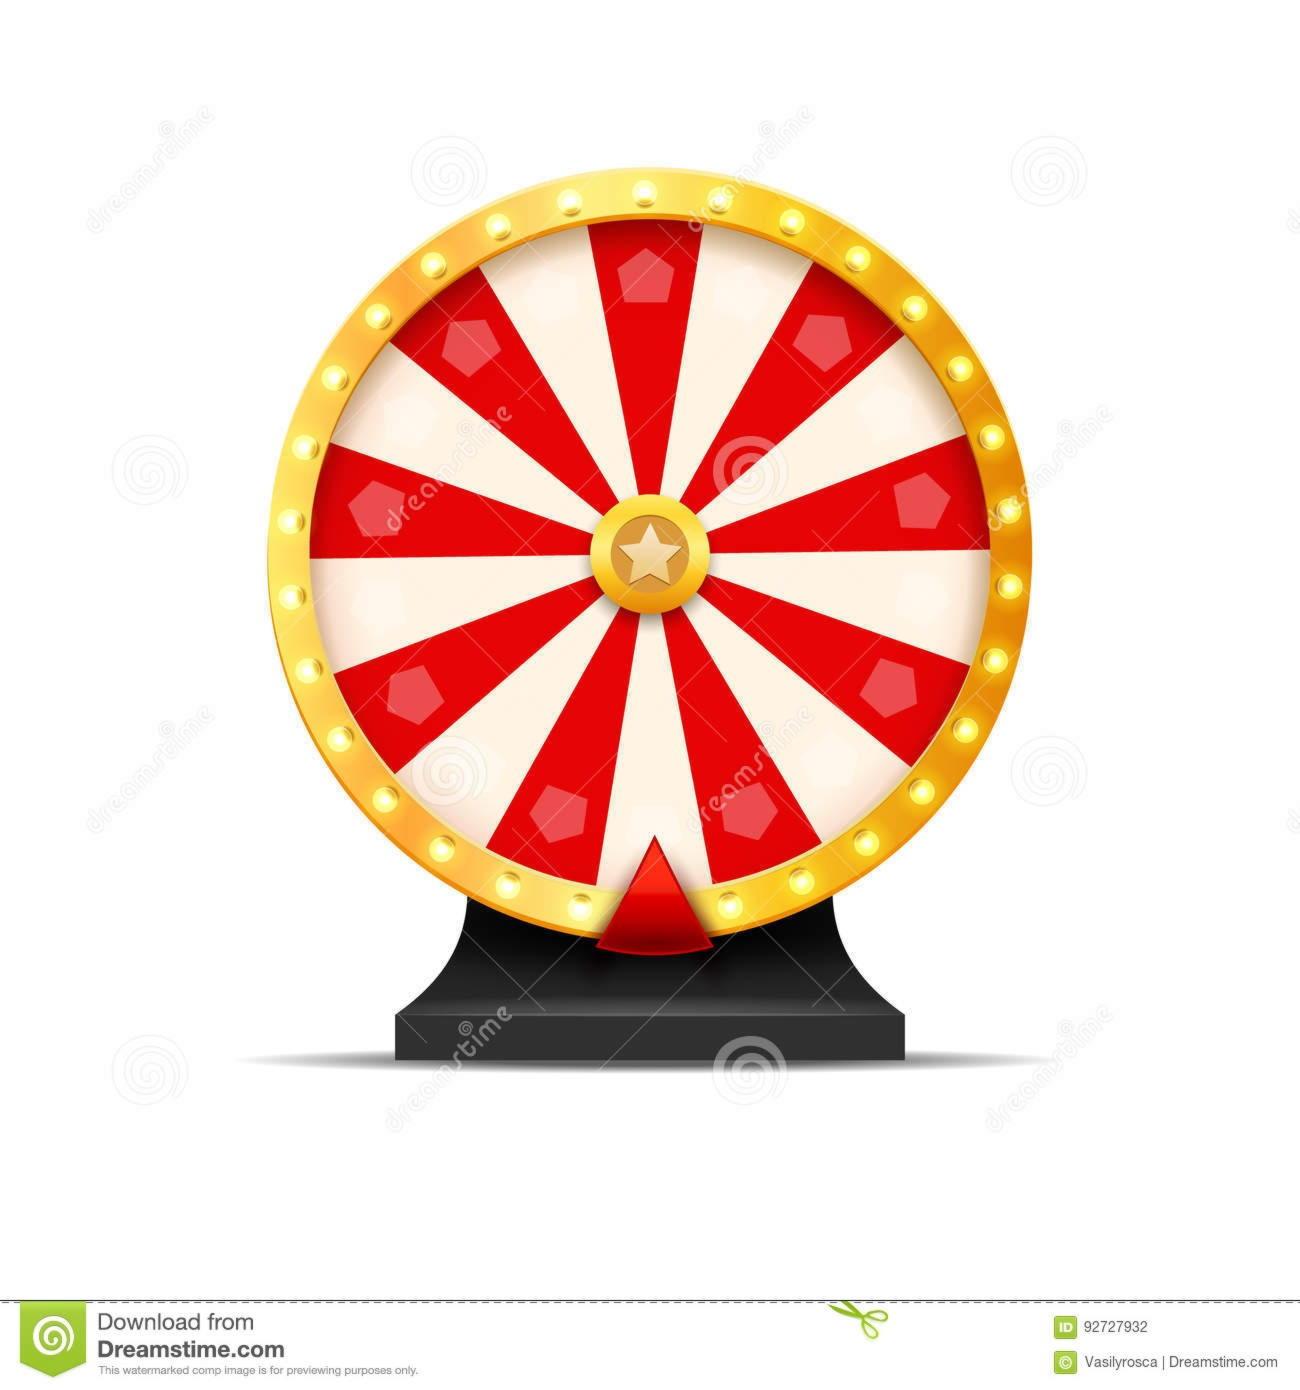 $ 735 Free Casino Tournament Spinlandissa